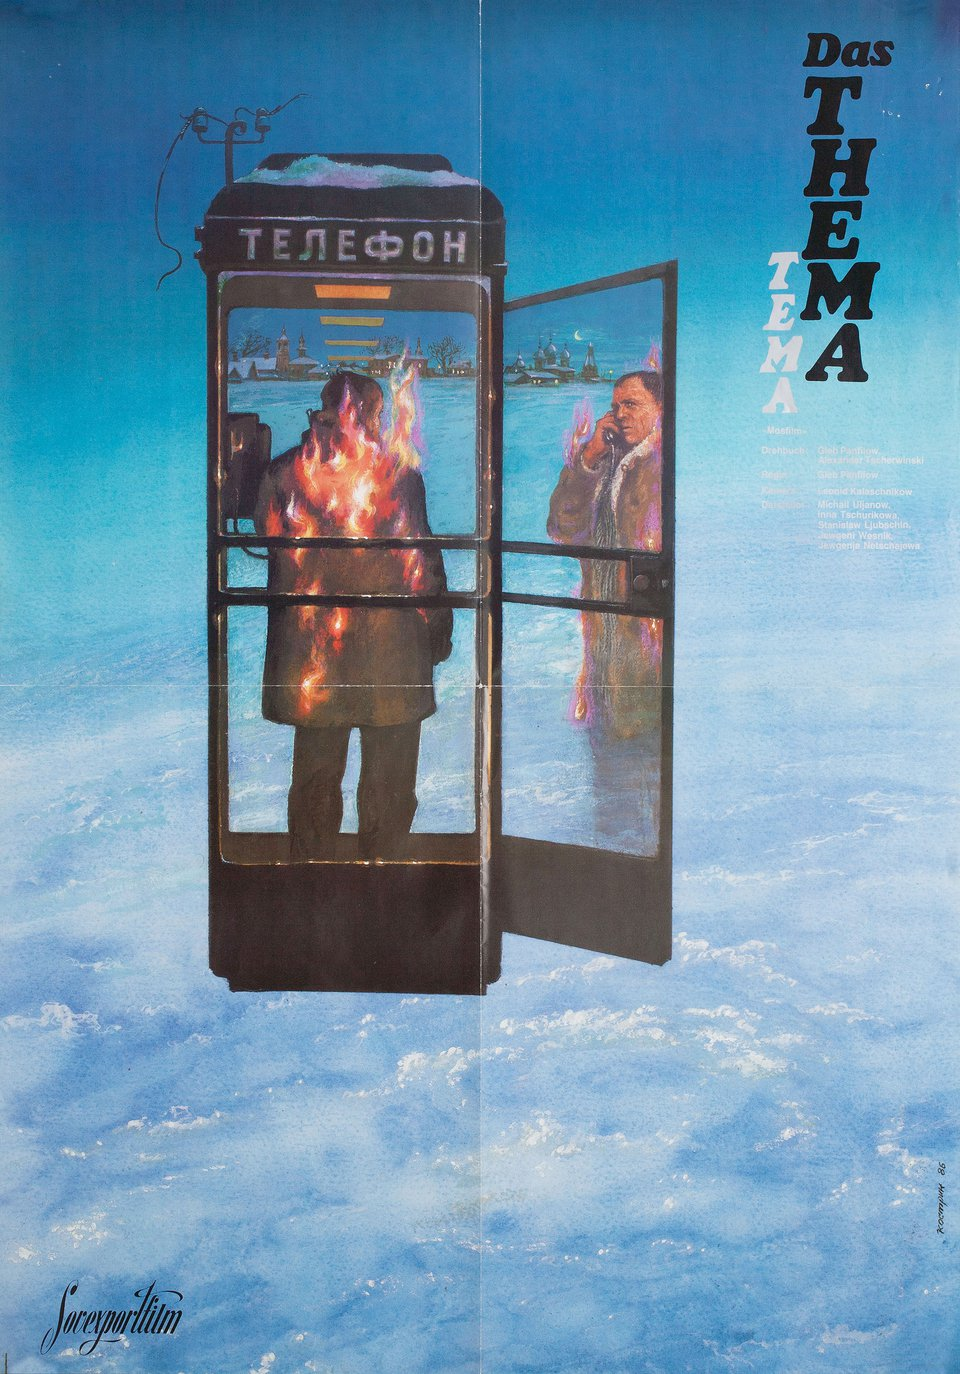 Tema 1986 Russian B1 Poster